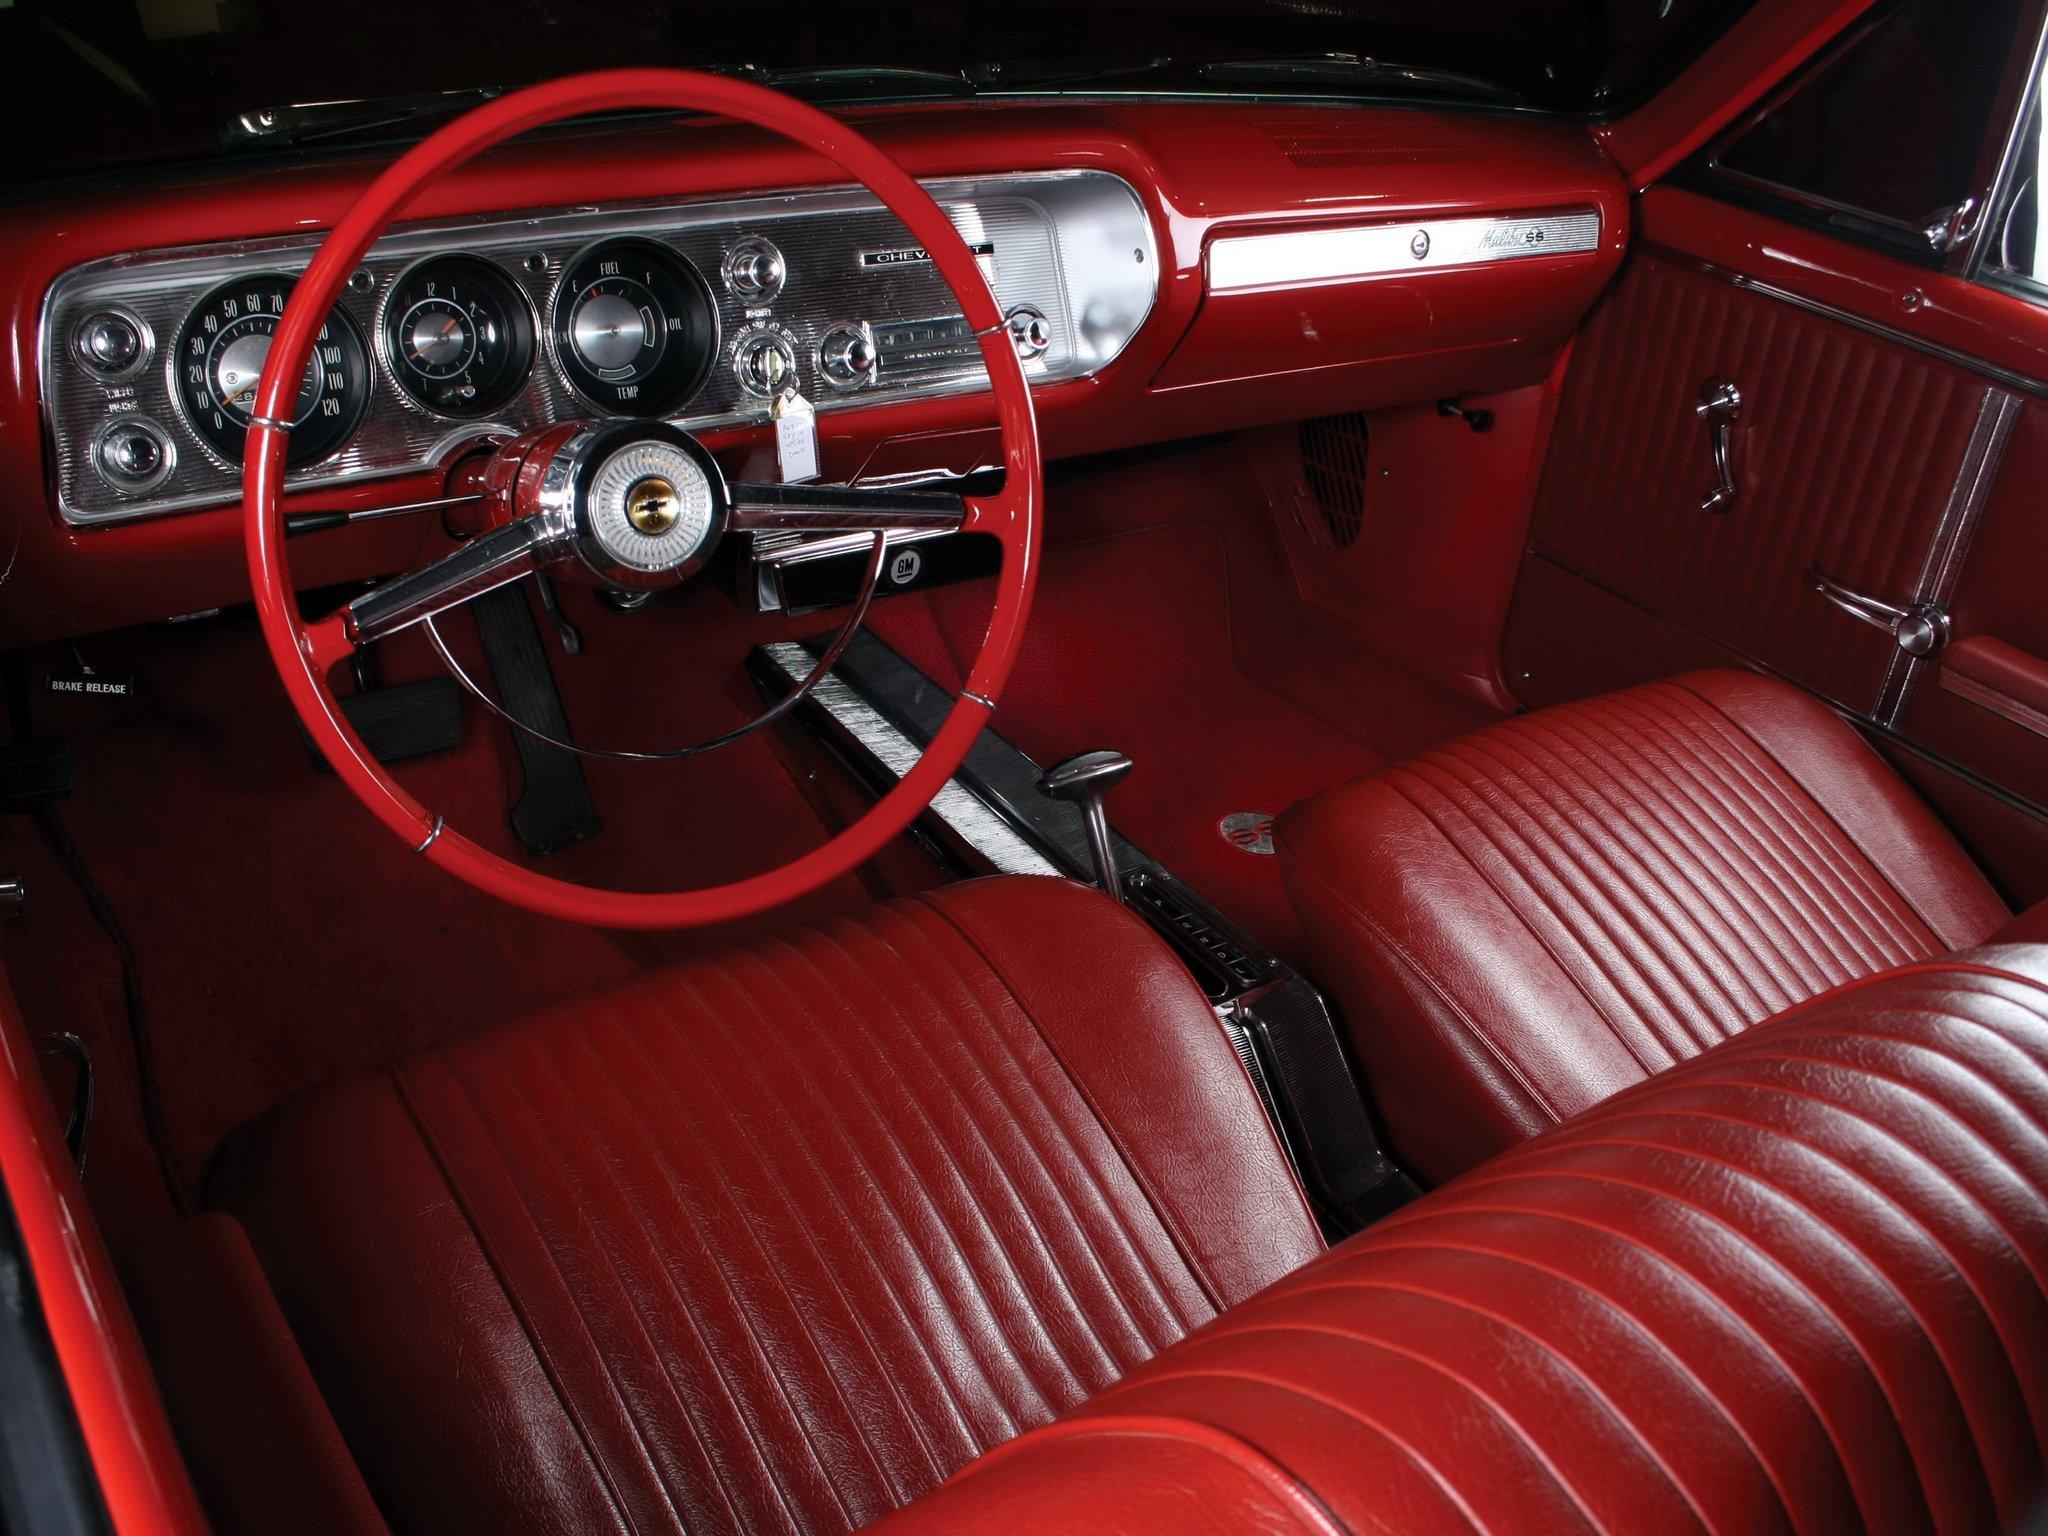 2014 Chevrolet Impala Expert Reviews Specs and Photos